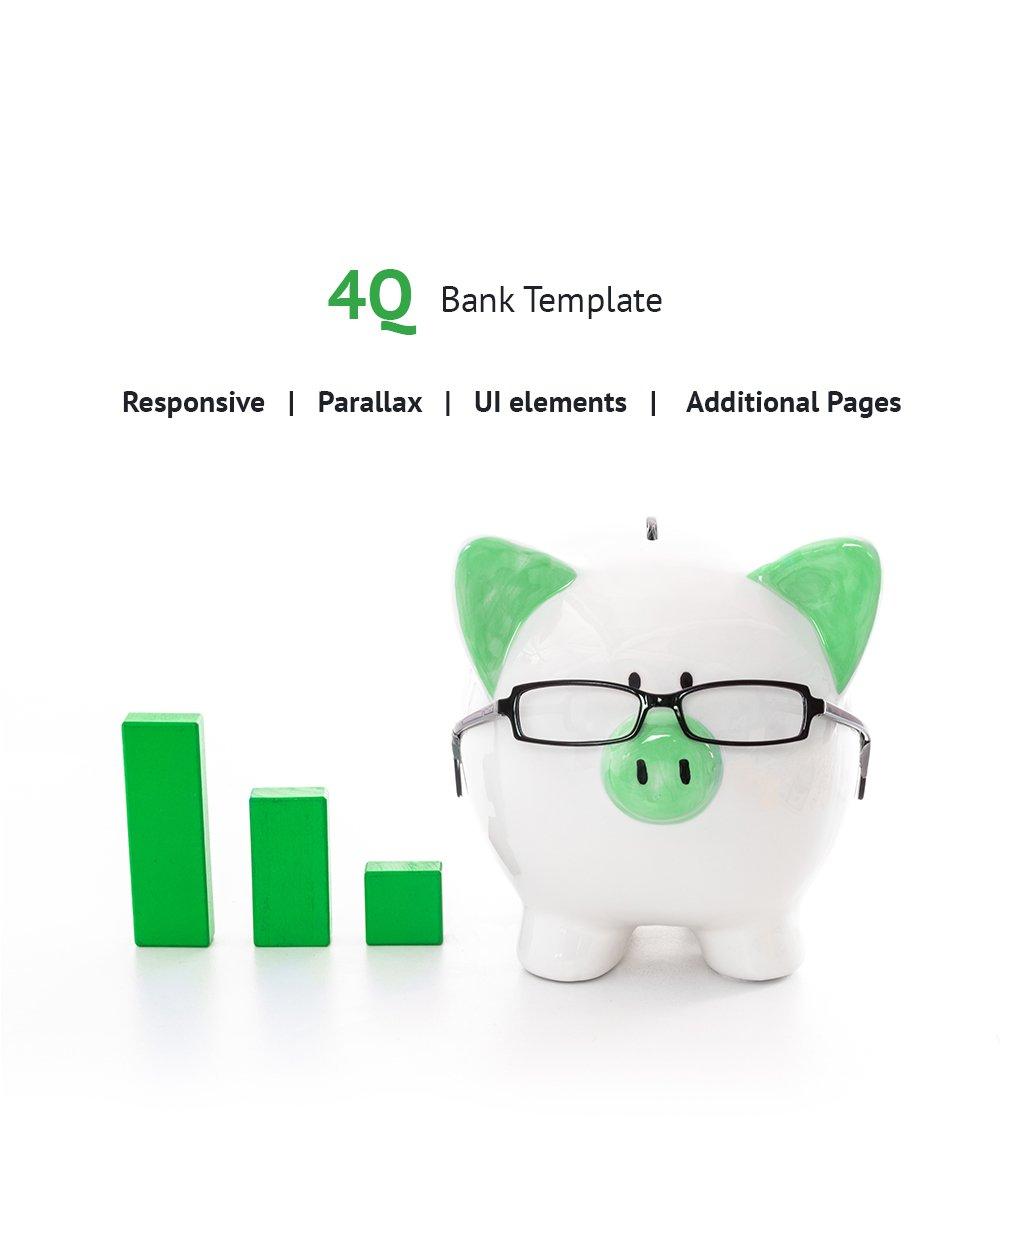 bank responsive joomla template 63834. Black Bedroom Furniture Sets. Home Design Ideas